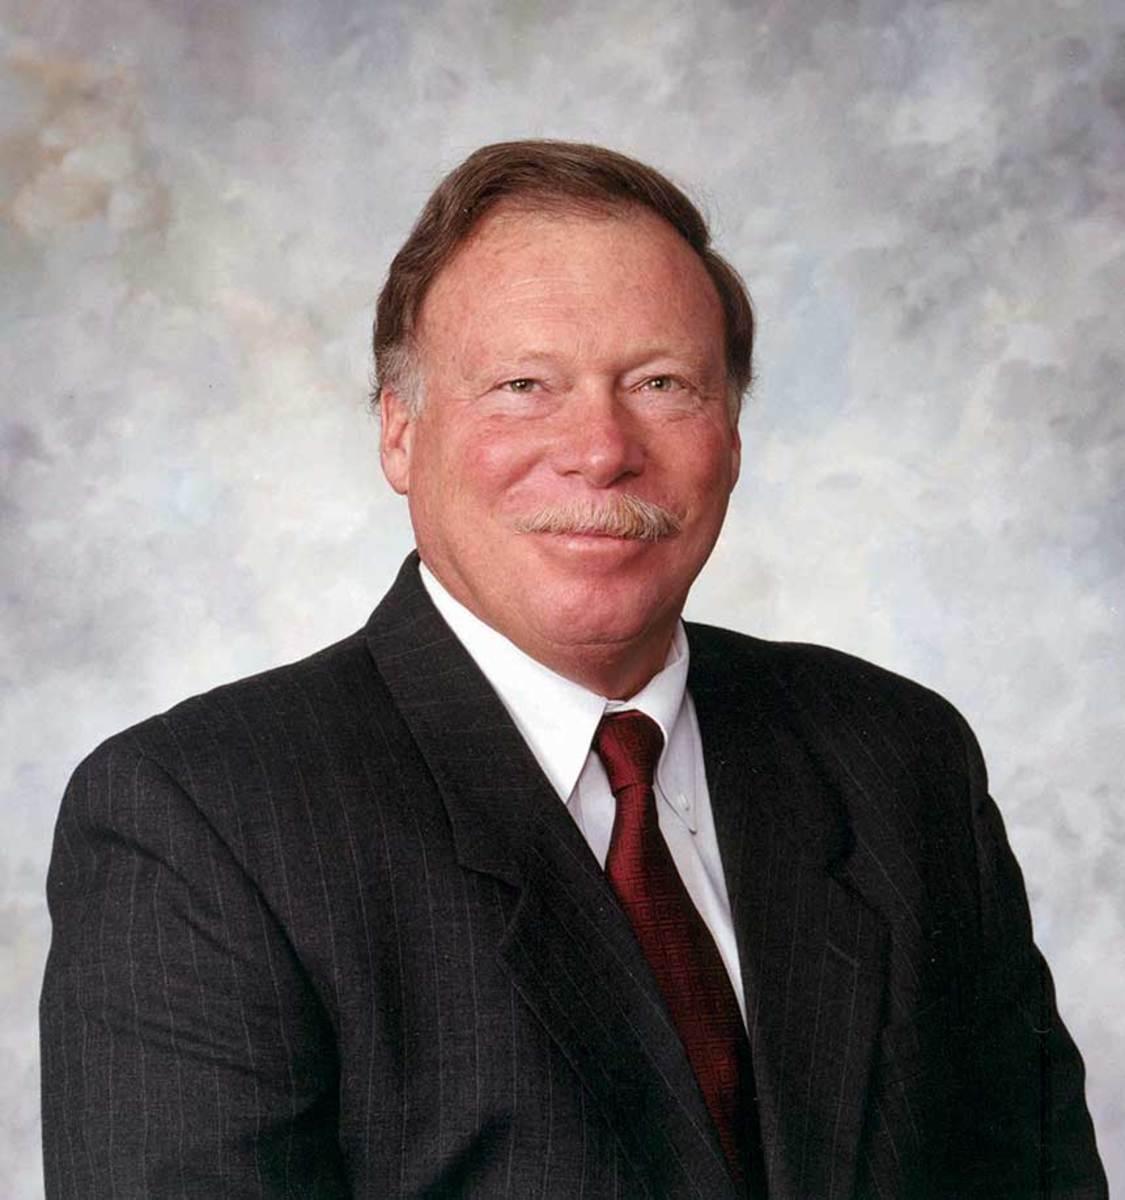 Phil Dyskow